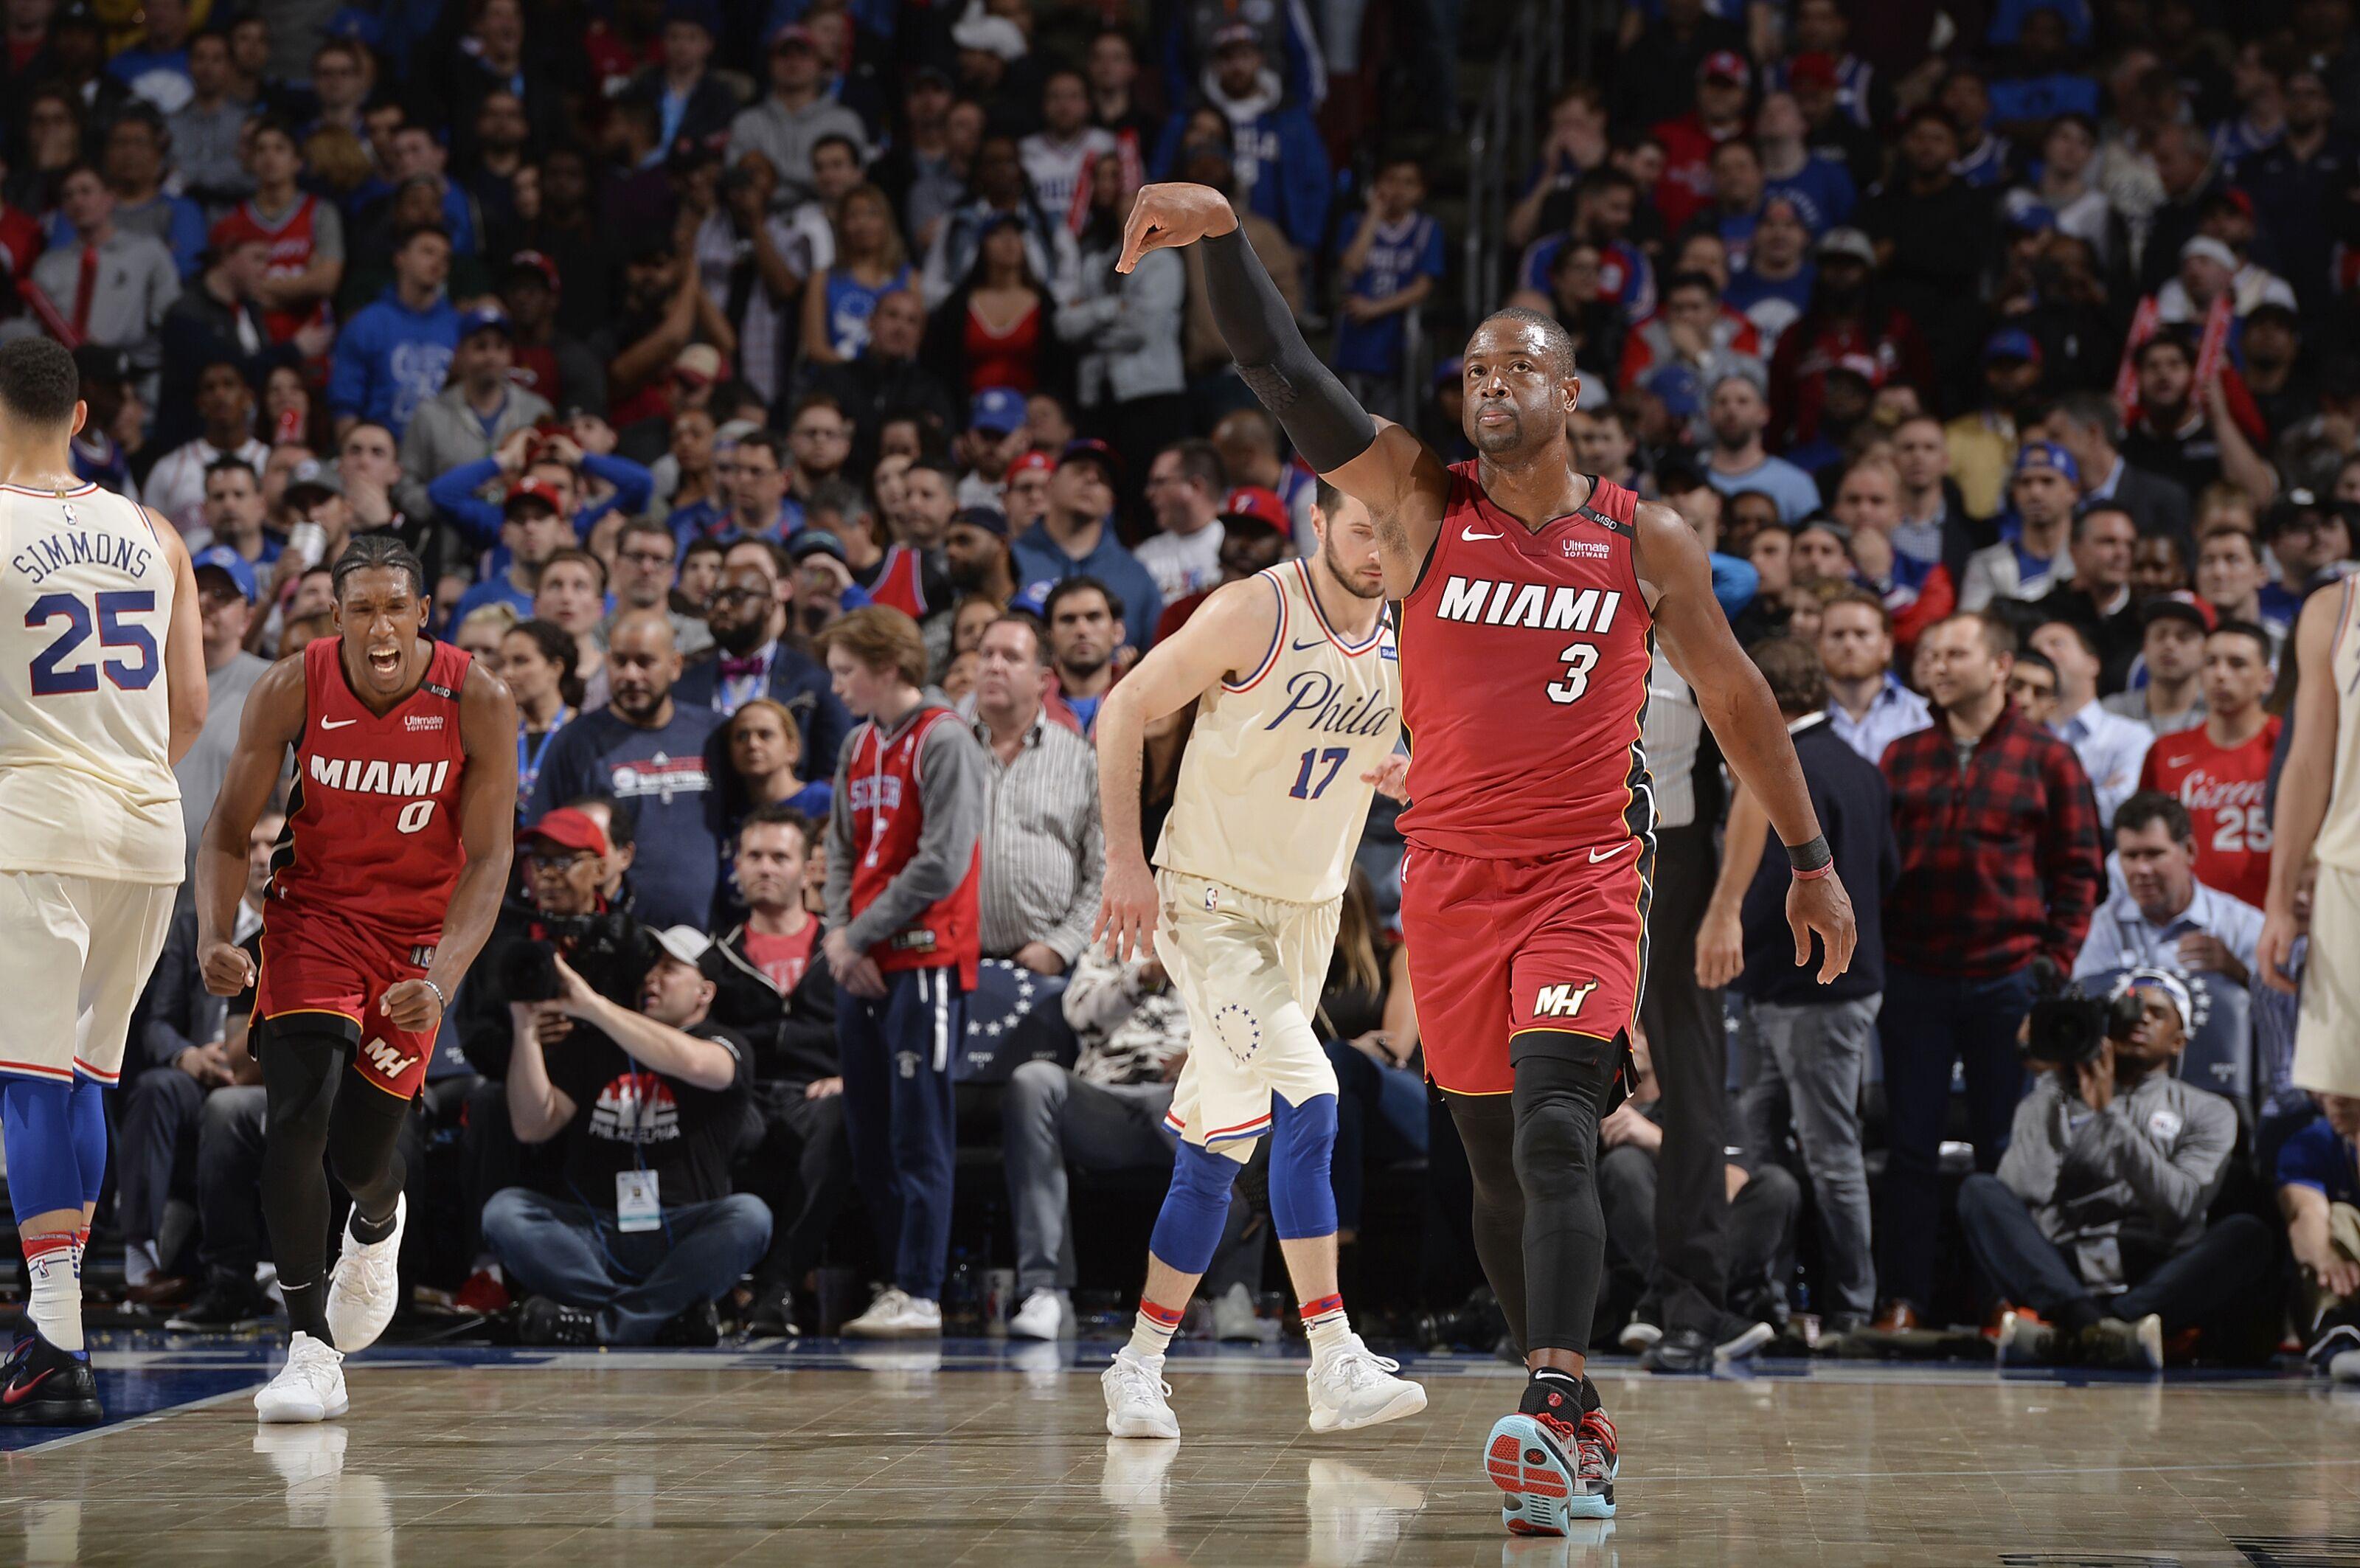 Miami Heat: 3 takeaways from Game 2 vs. Philadelphia 76ers